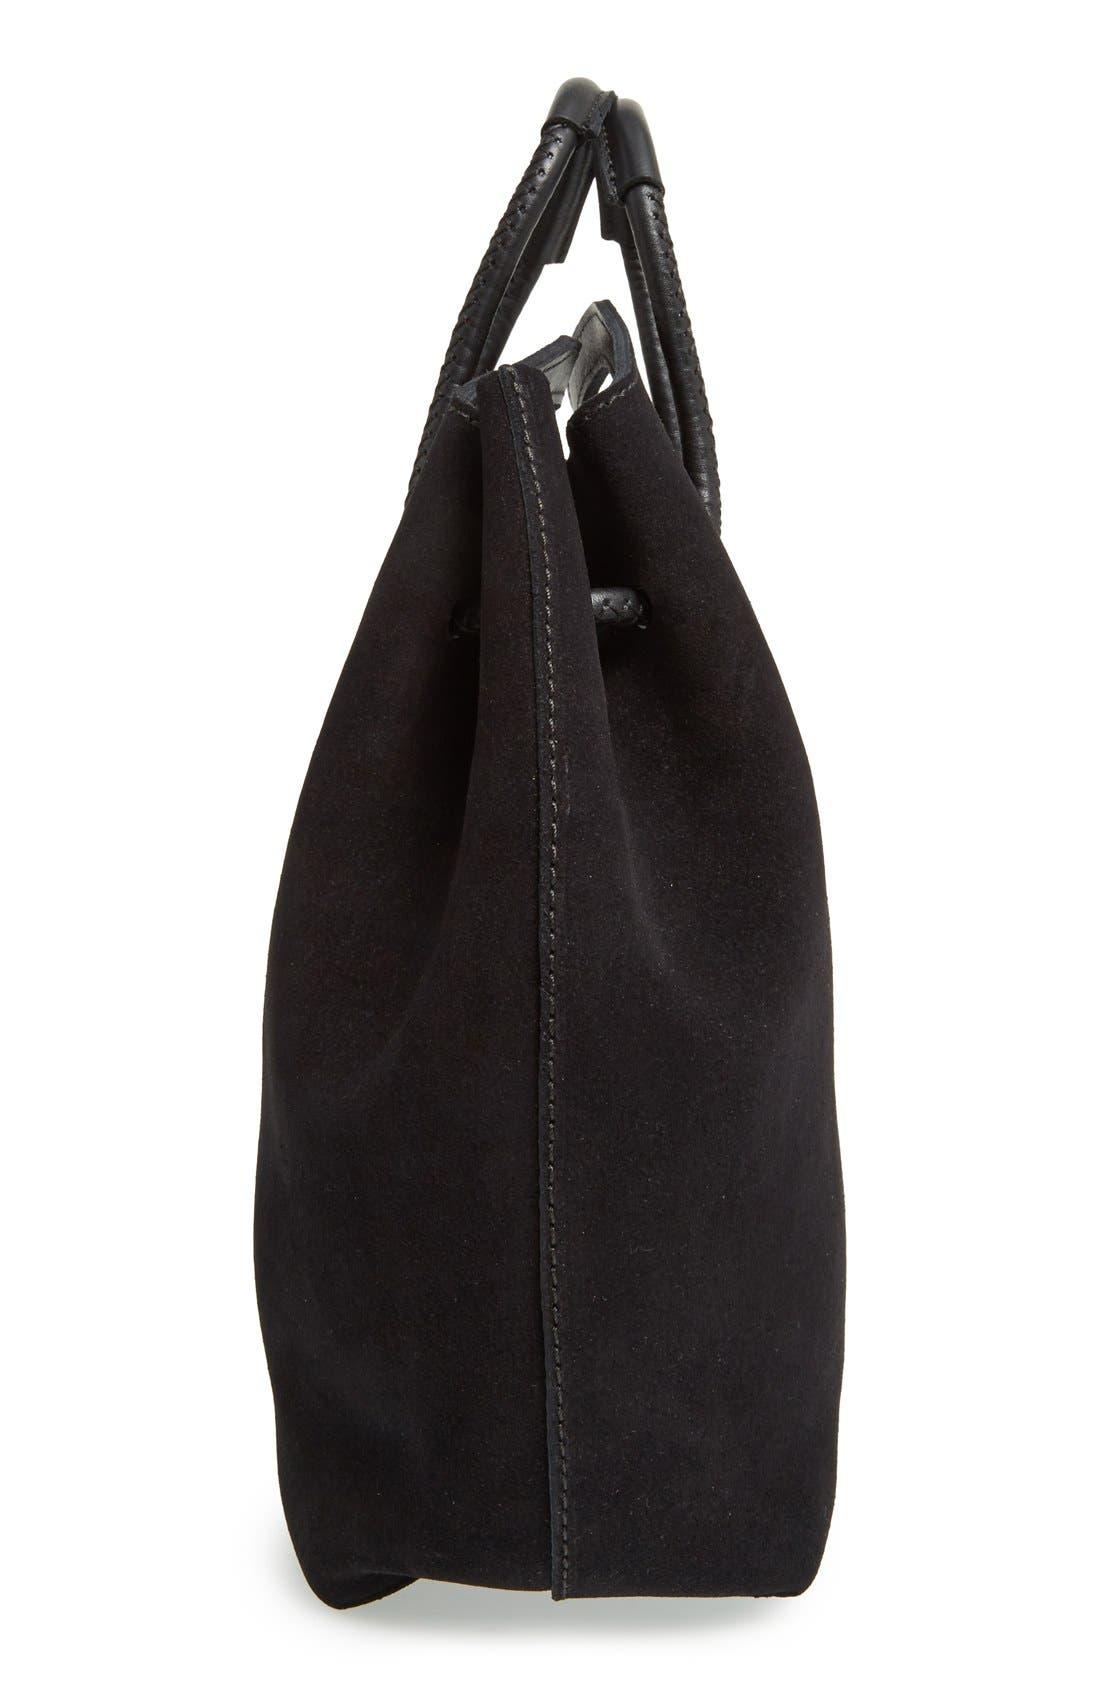 PEDRO GARCIA, Suede Drawstring Bucket Bag, Alternate thumbnail 5, color, 002